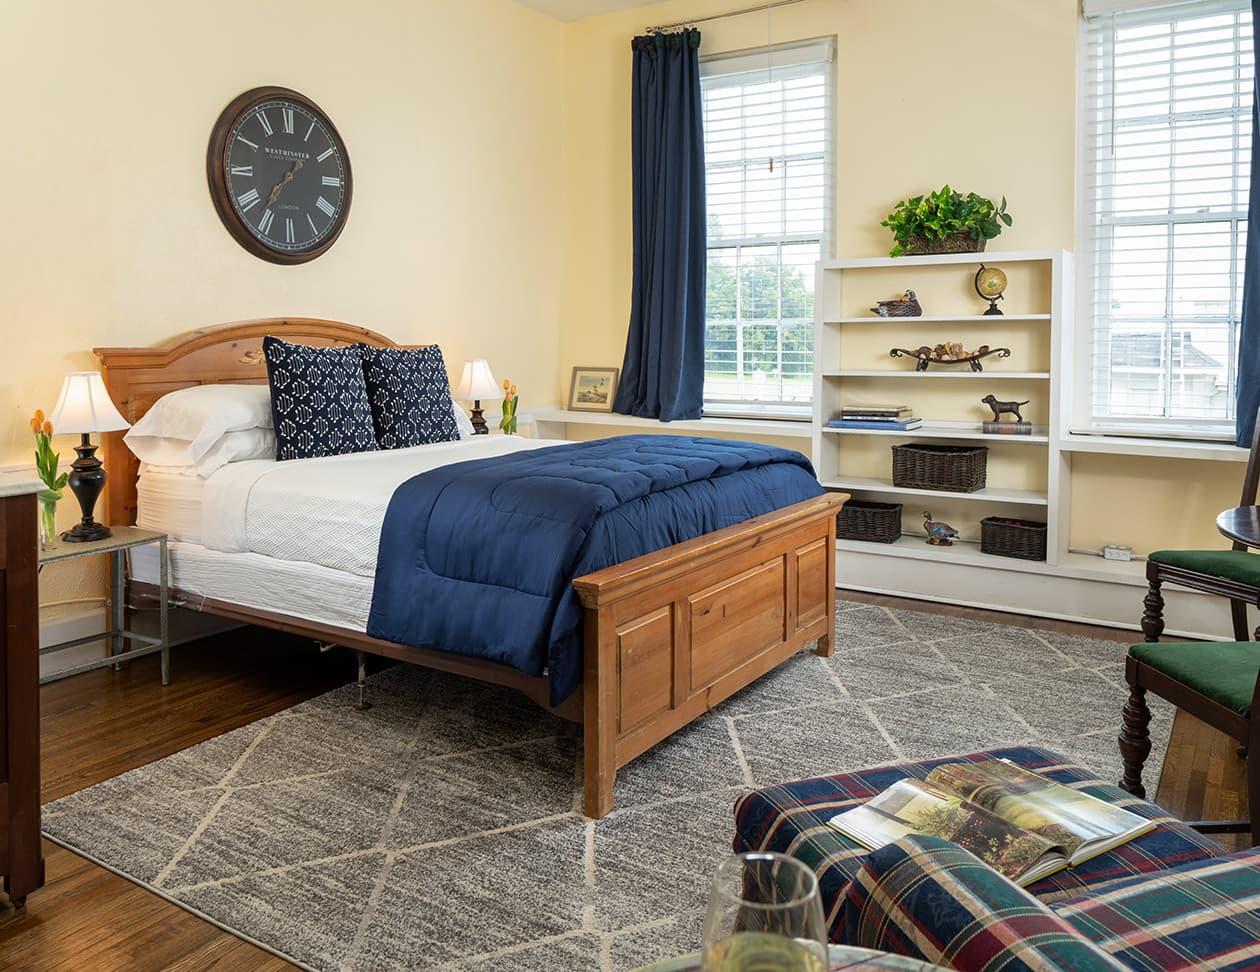 Flyways room bed